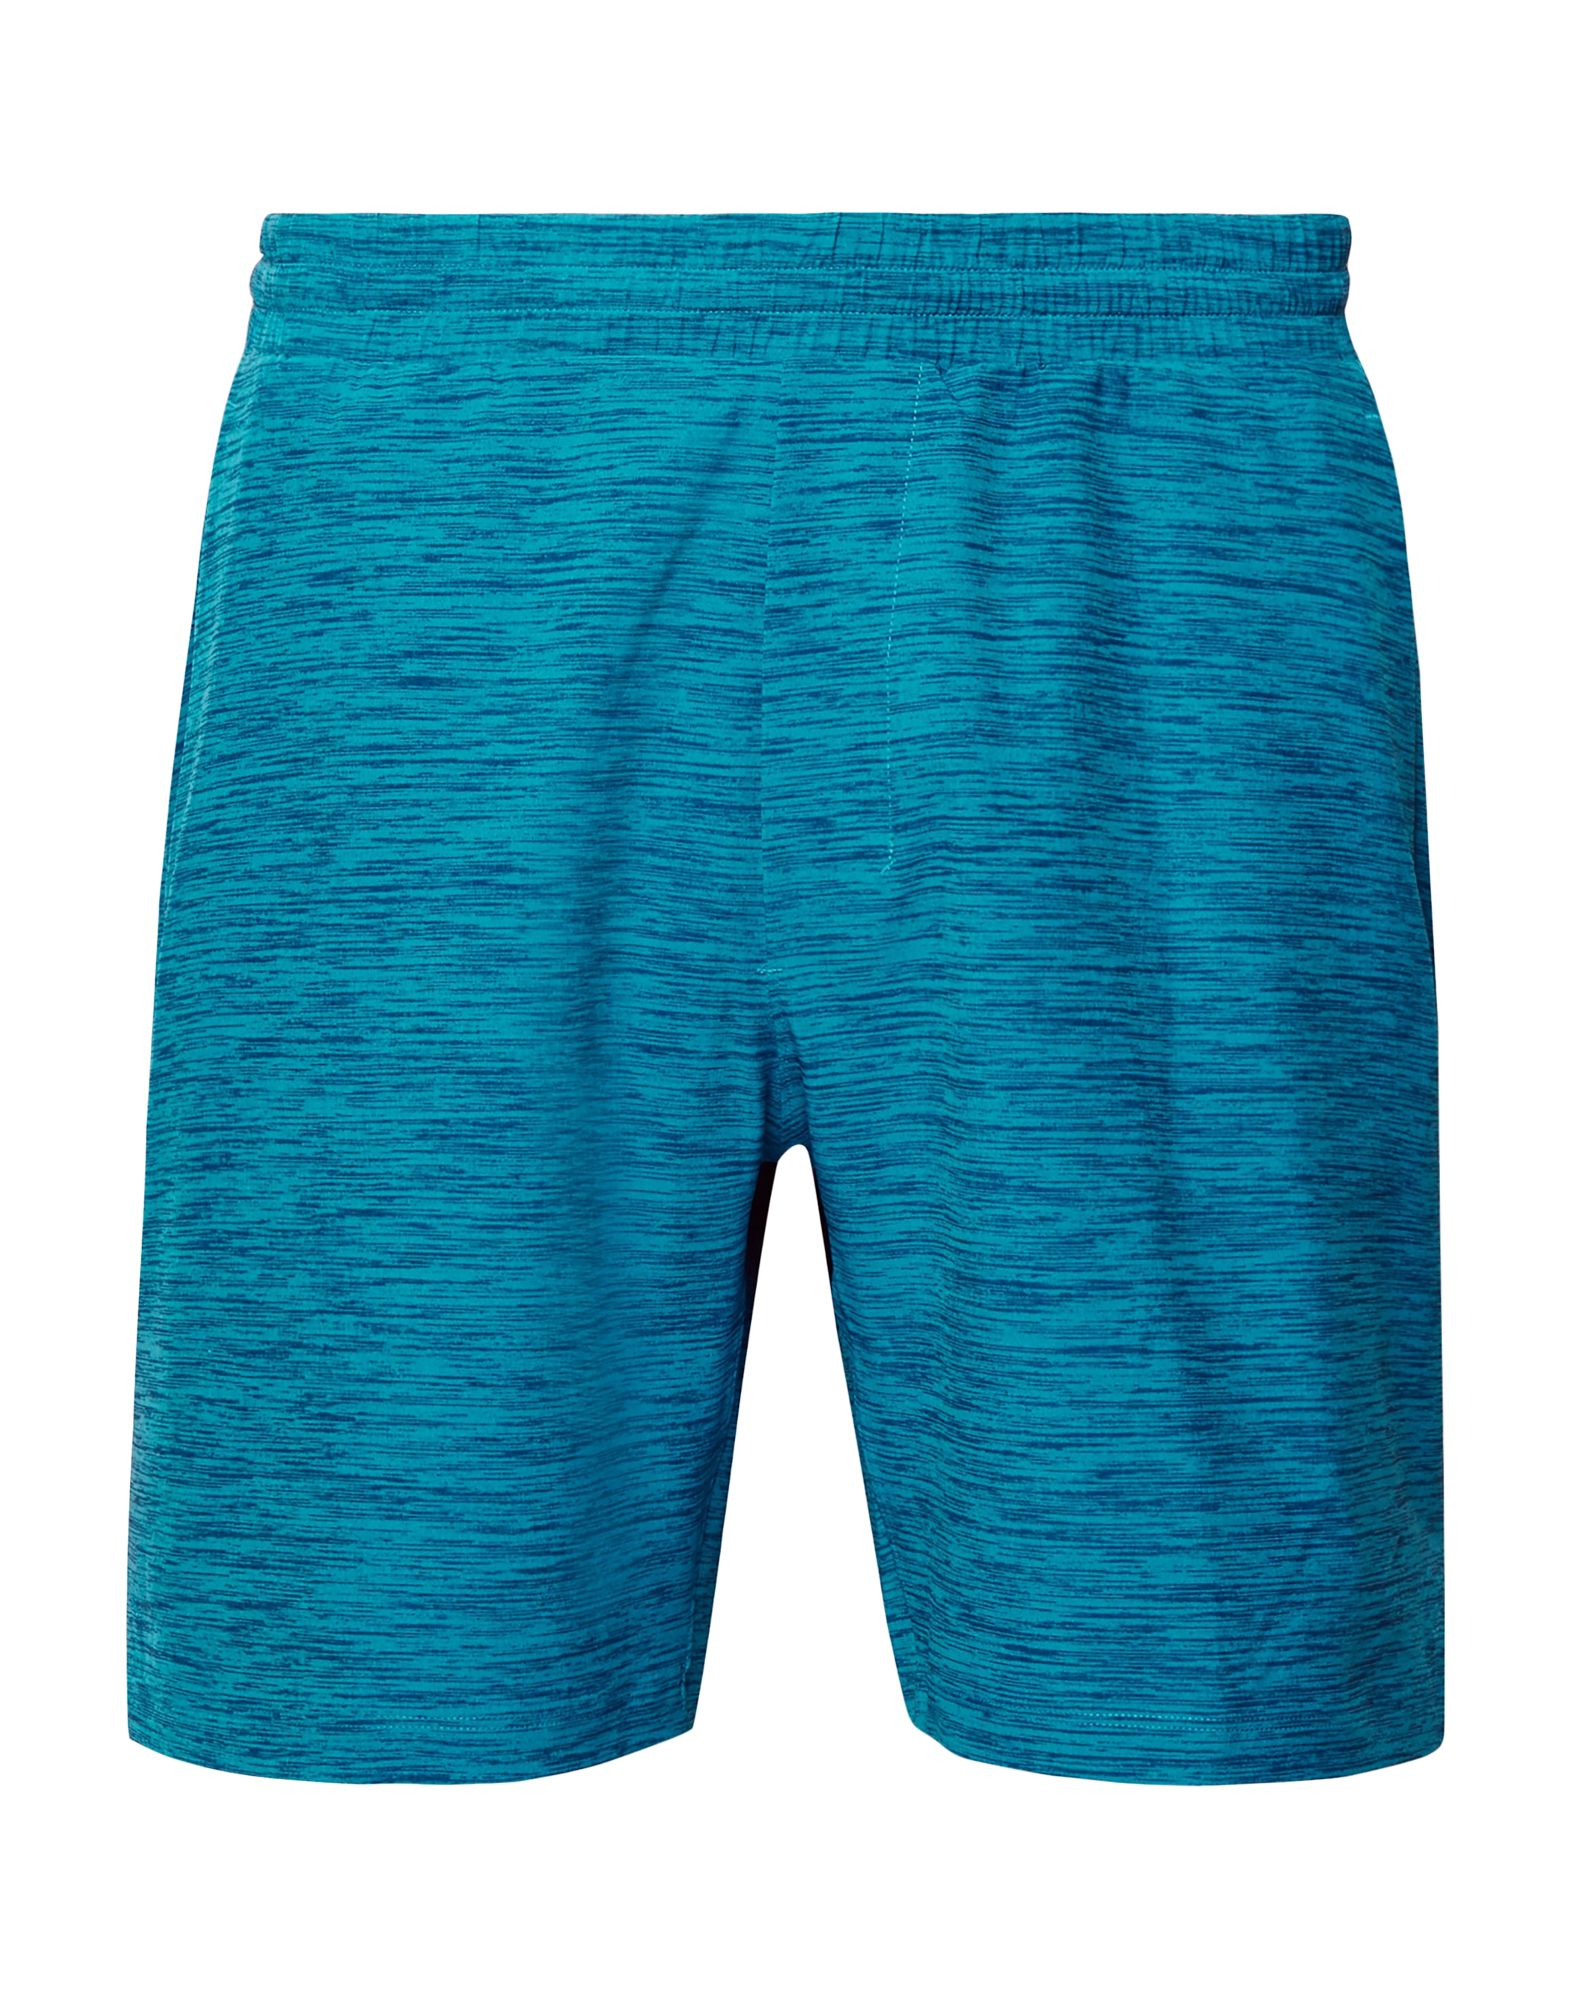 LULULEMON Swim trunks. synthetic jersey, no appliqués, two-tone, multipockets, elasticized waist, internal slip, stretch. 90% Polyester, 10% Elastane